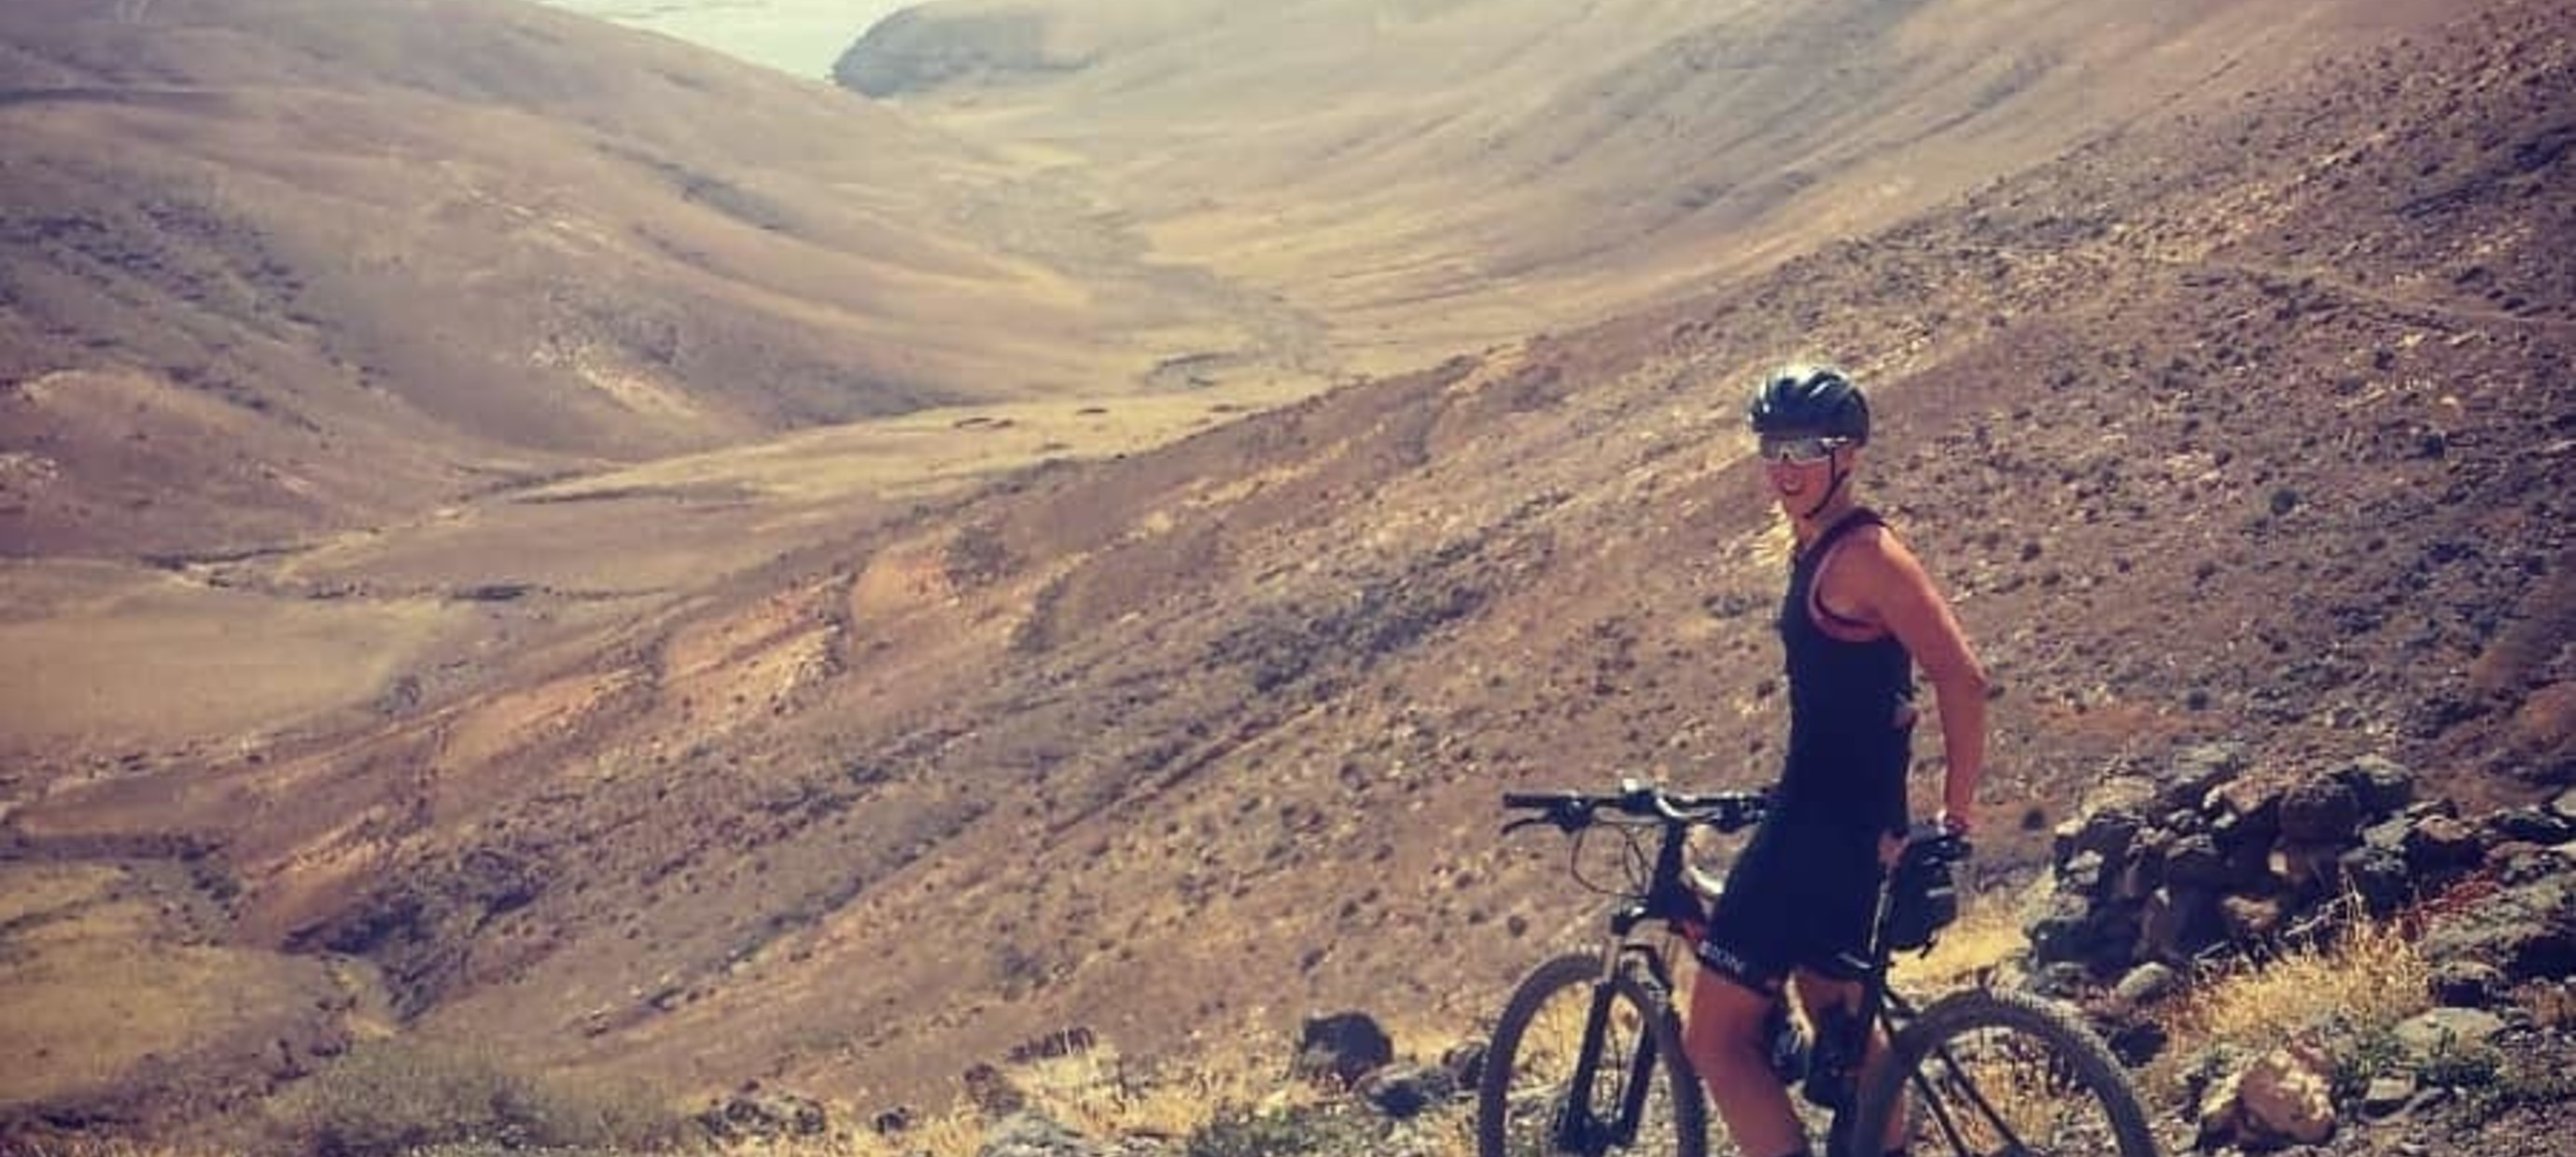 """#eatsleeptrainrepeat modus"" Lanzarote | FusionTEAMnl atlete Claudia Striekwold |"